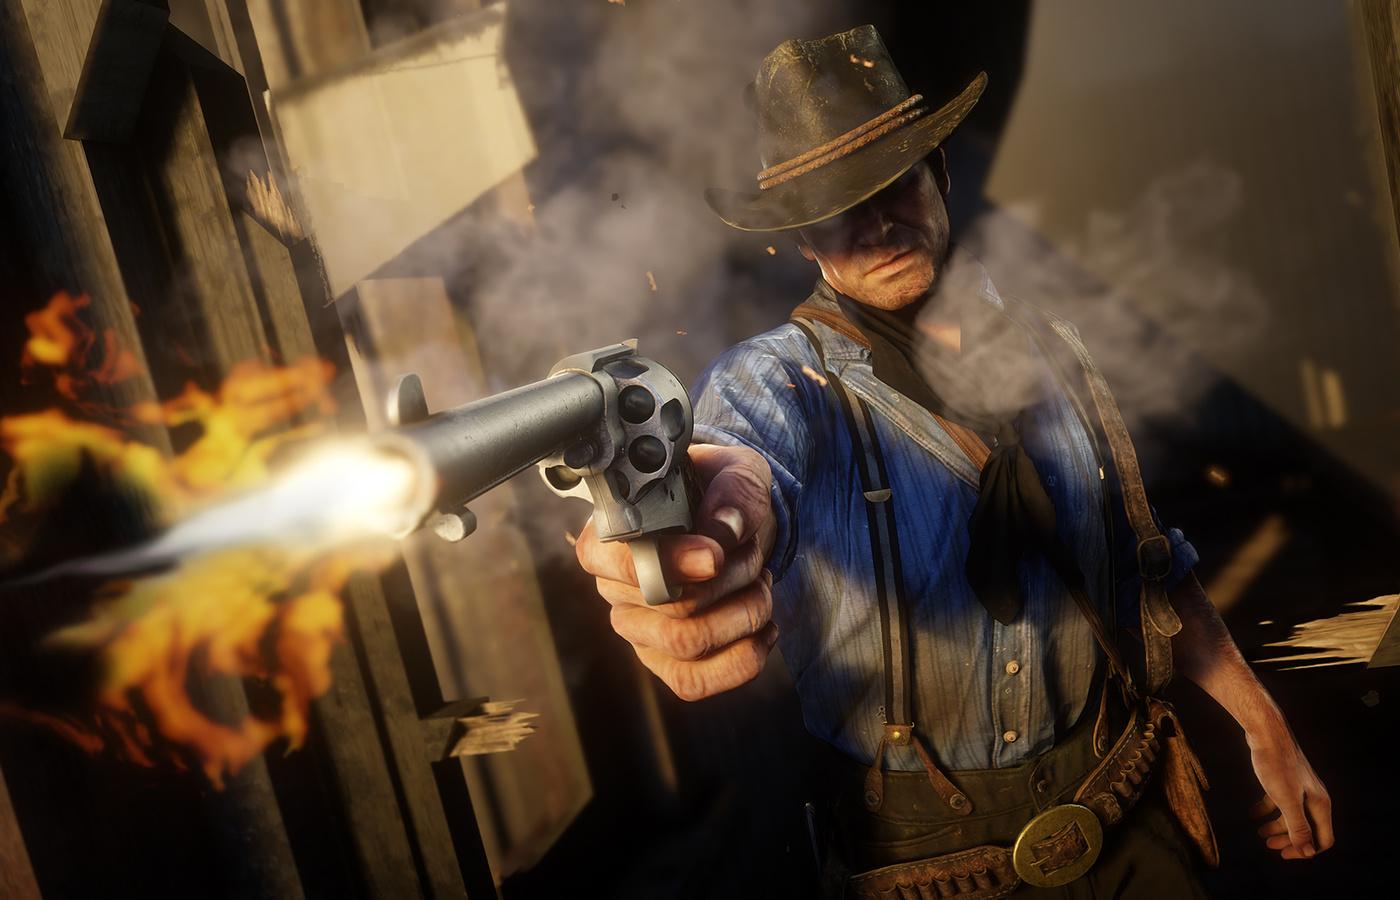 1400x900 Arthur Morgan In Red Dead Redemption 2 1400x900